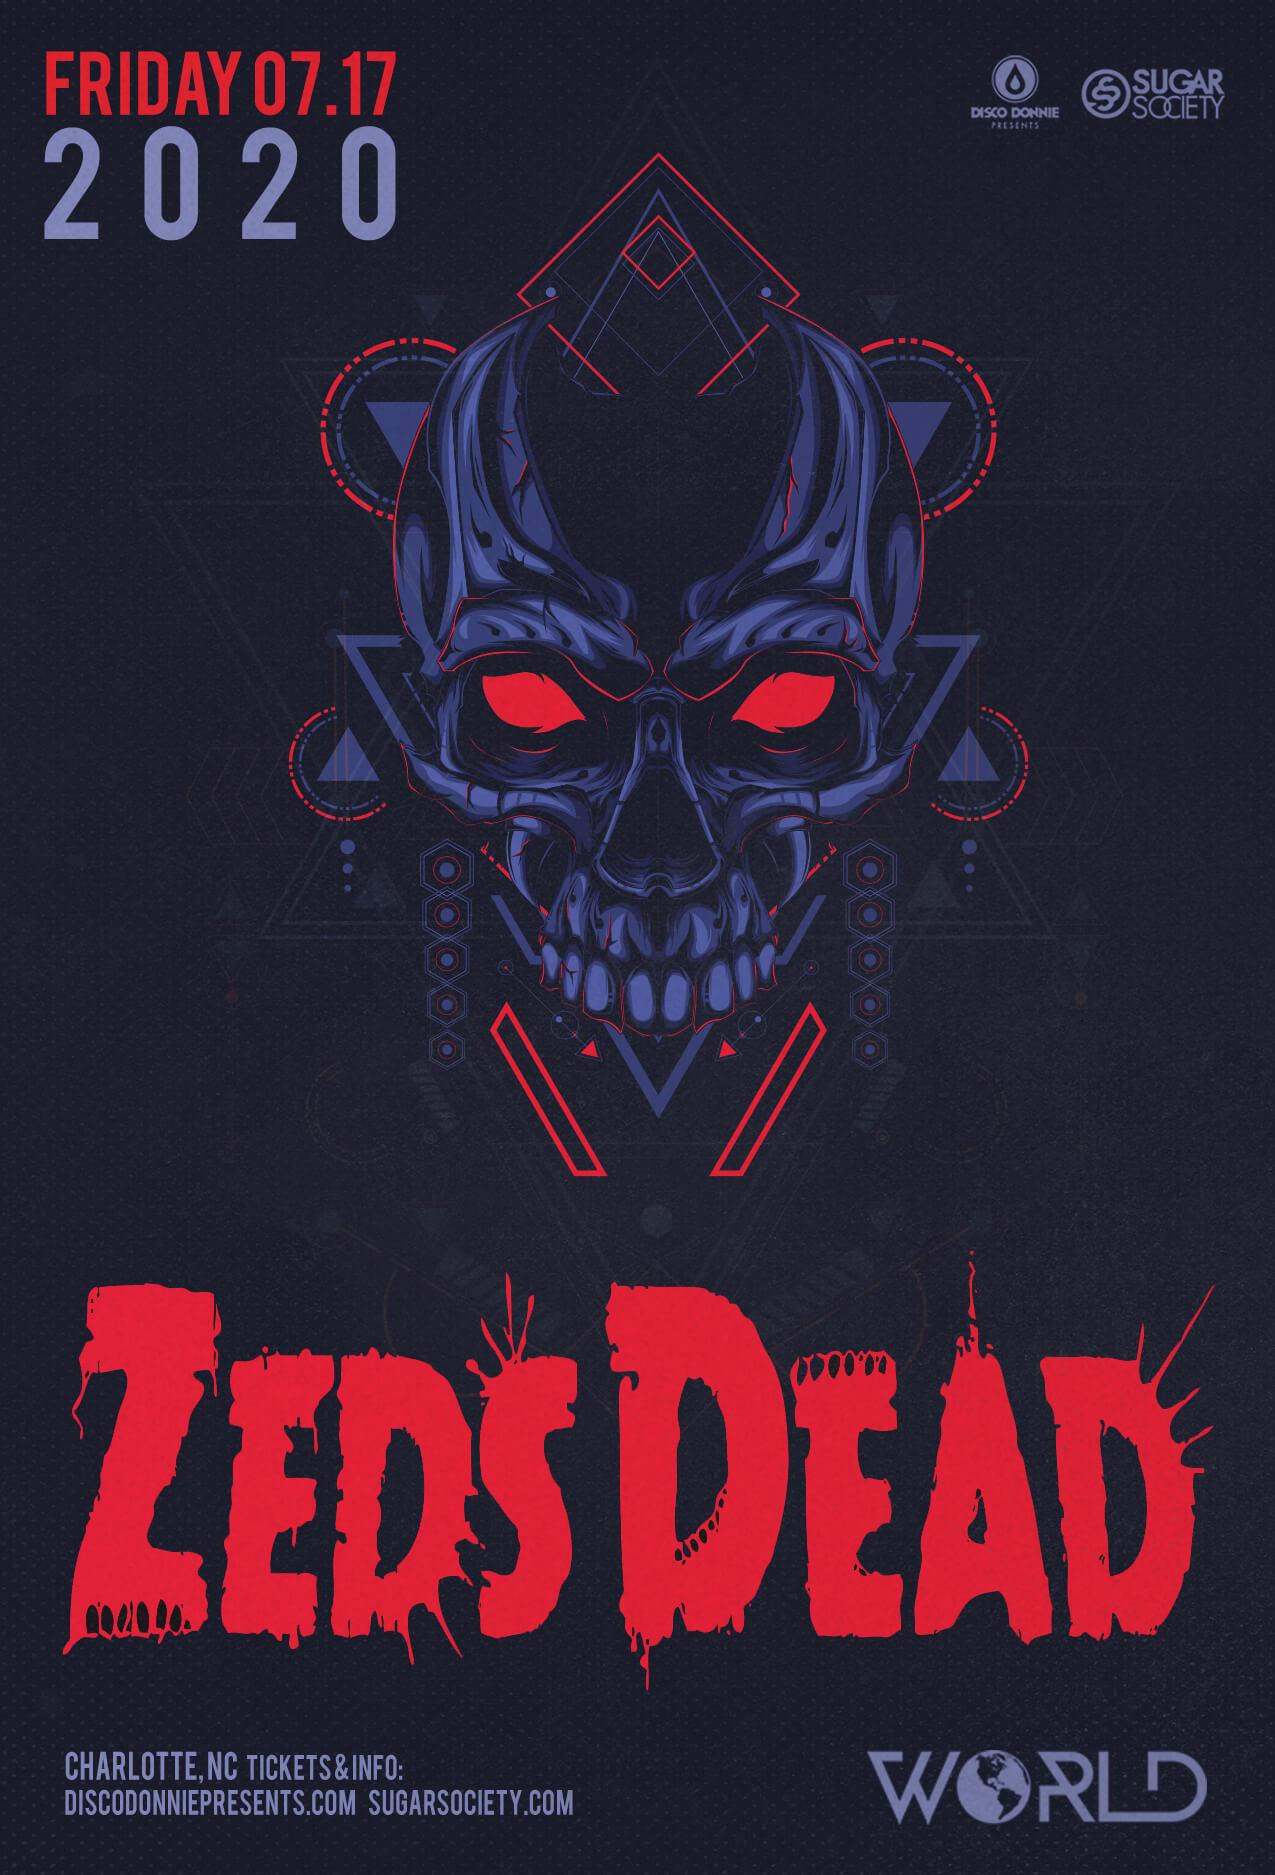 Zeds Dead in Charlotte